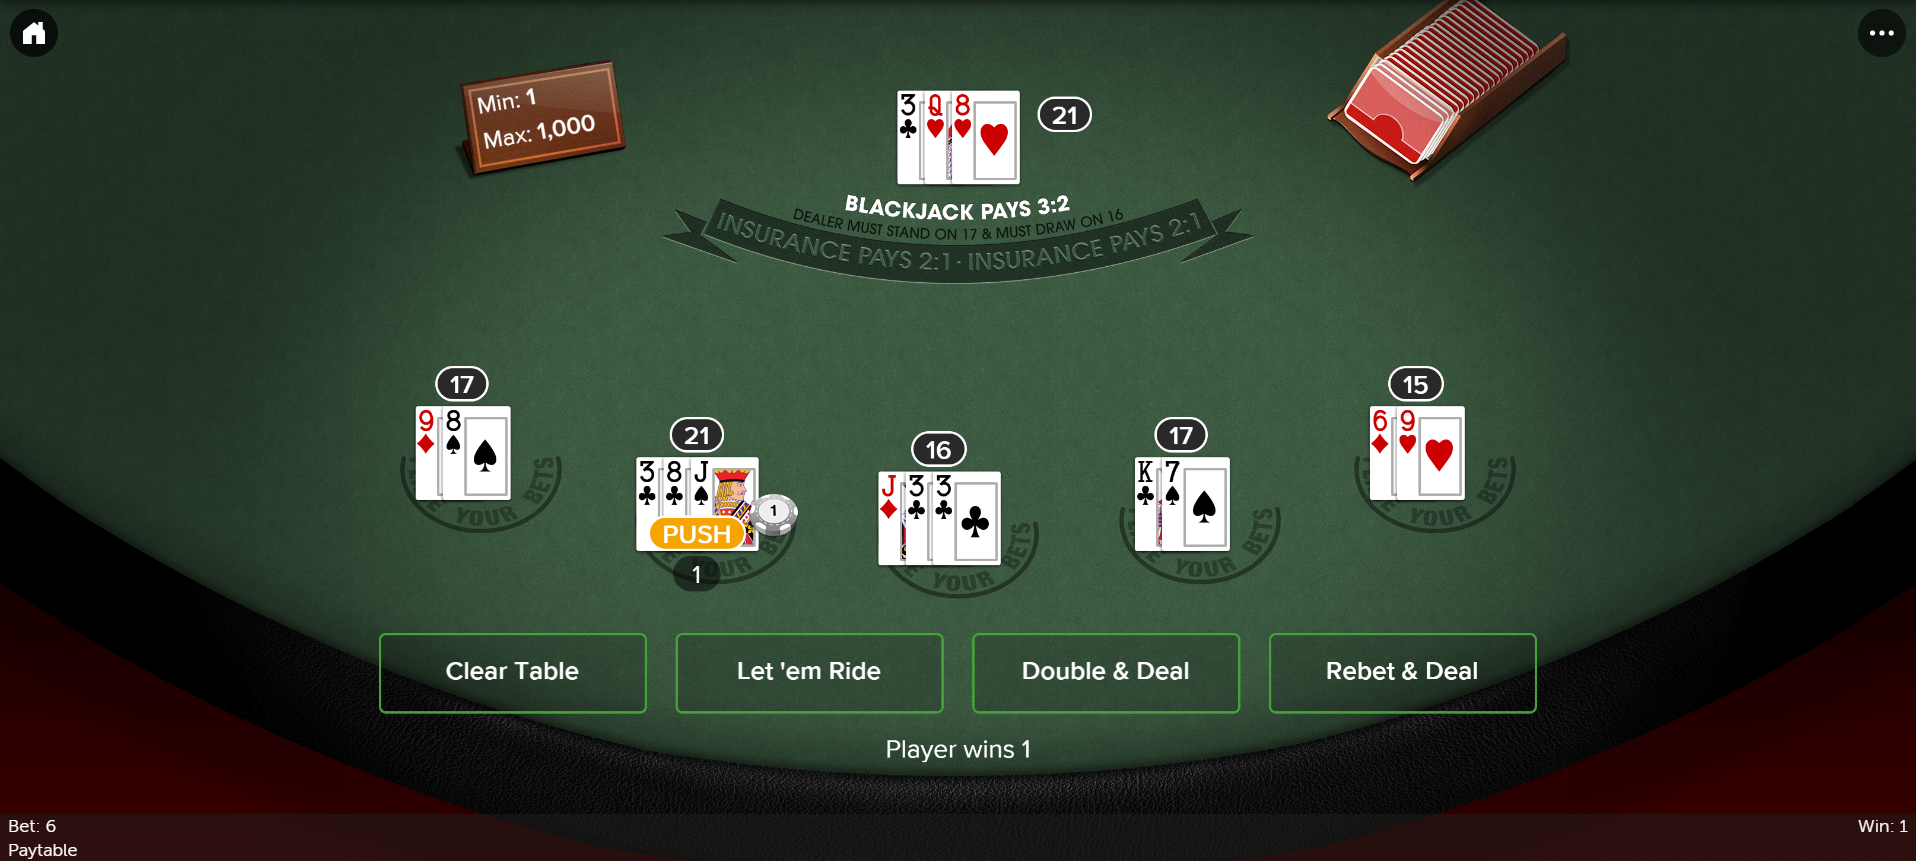 Tropicana NJ Online Blackjack